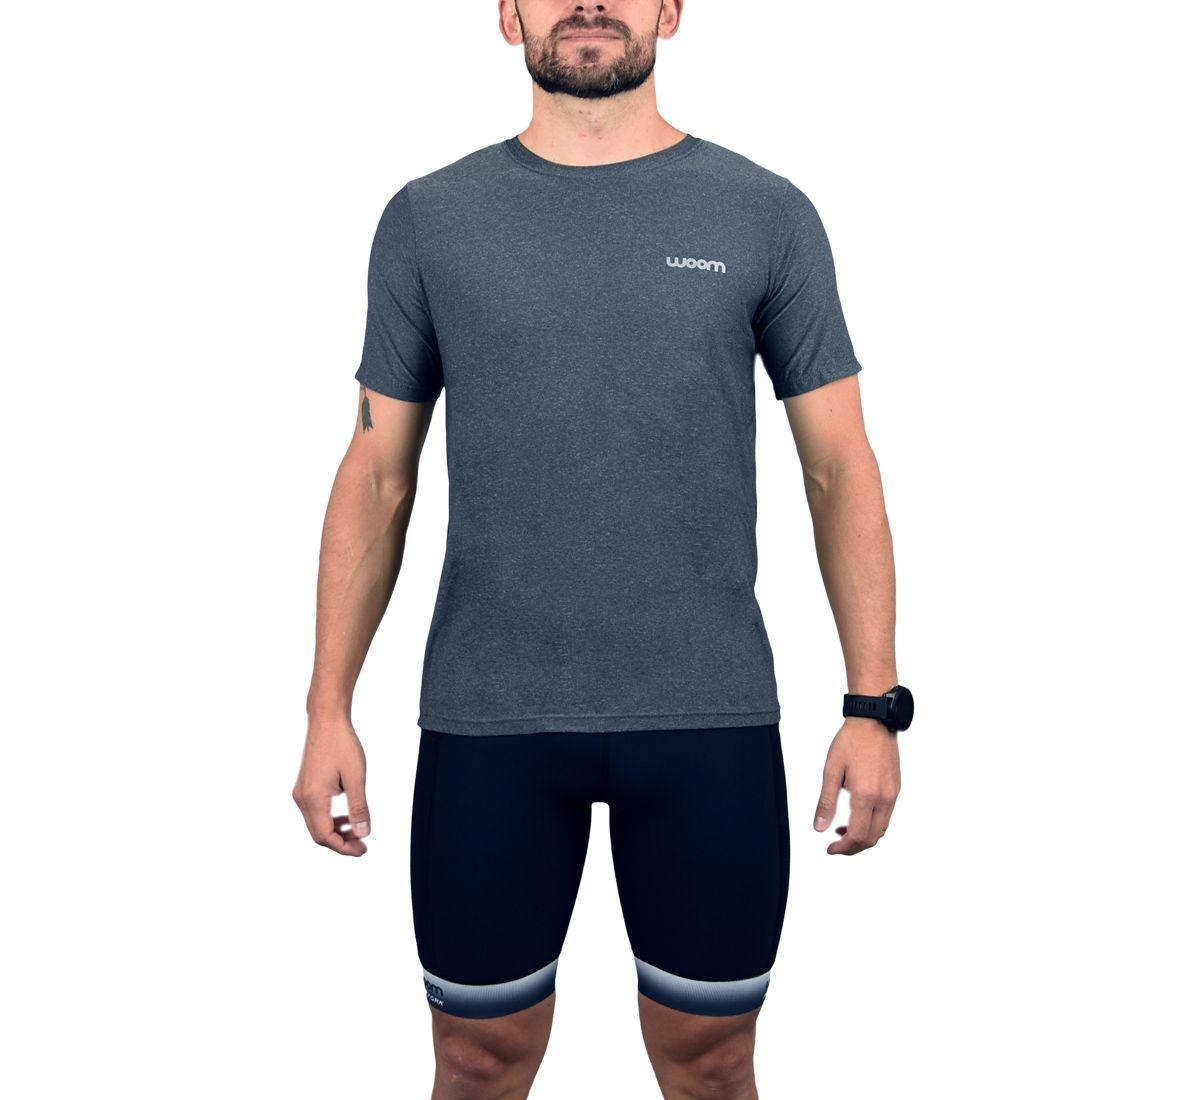 Camiseta Running Masc - Paxson - Silver